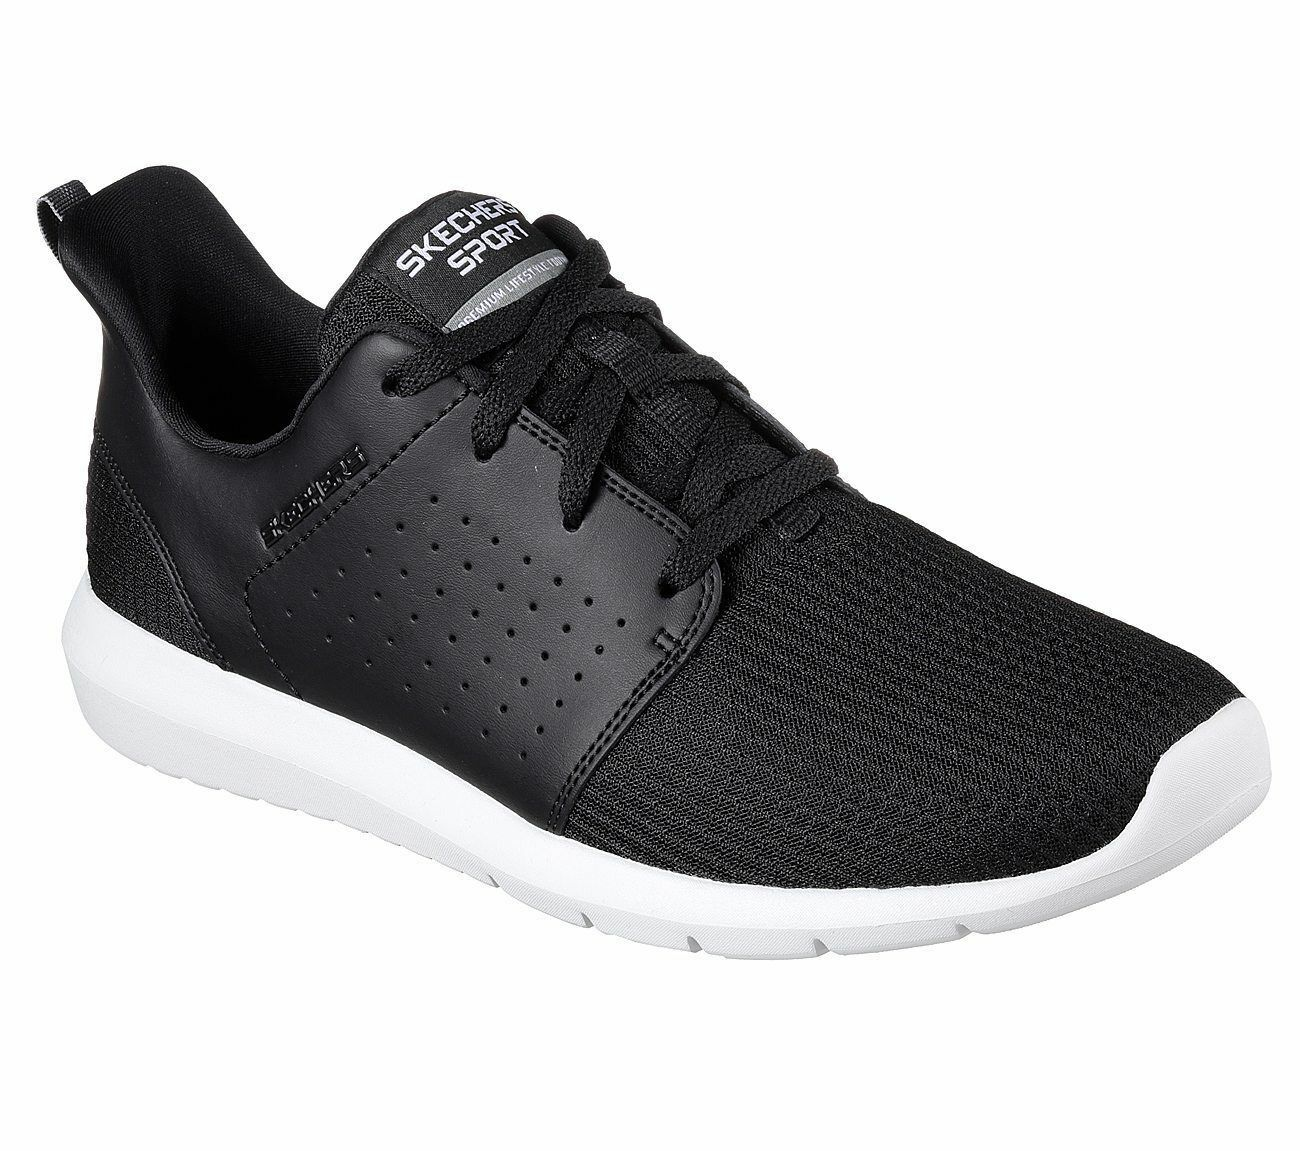 SKECHERS MENS FOREFLEX MEMORY FOAM WALKING SHOES 52390/BKW Cheap women's shoes women's shoes